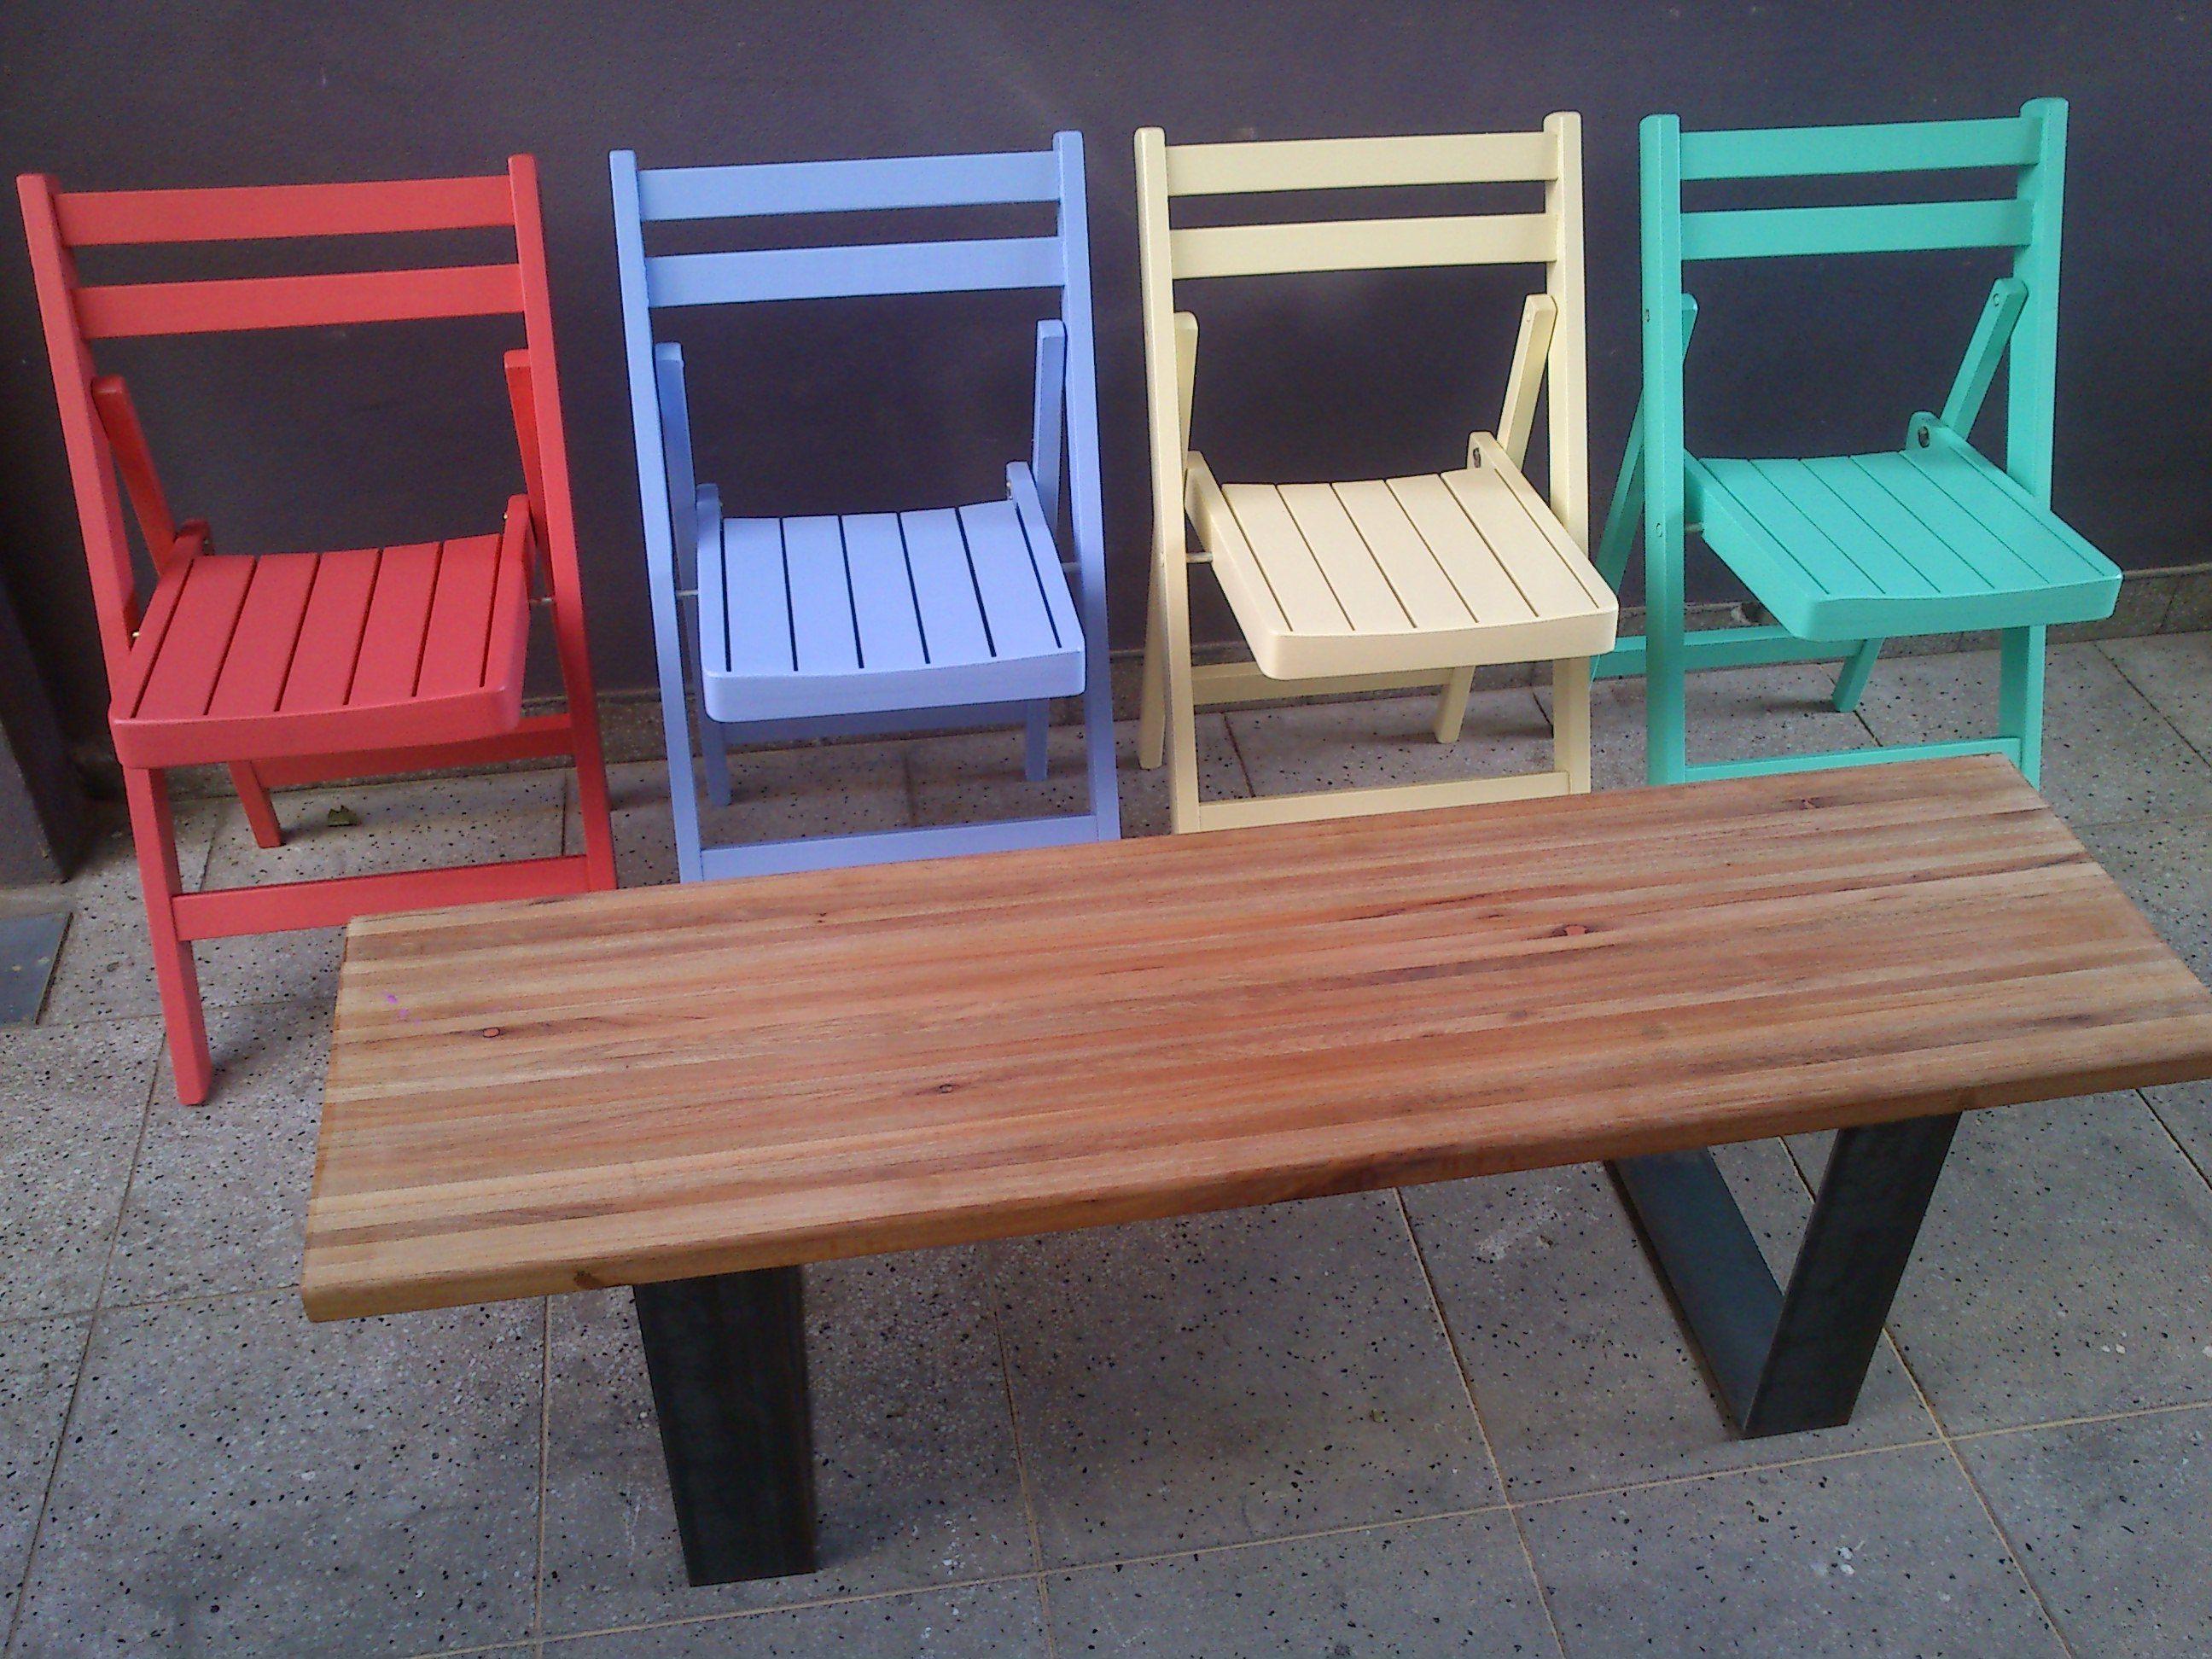 Mesa ratona de hierro y madera de eucalipto compensado de 1 45 x 0 40 m sillas plegables - Pintar sillas de madera ...